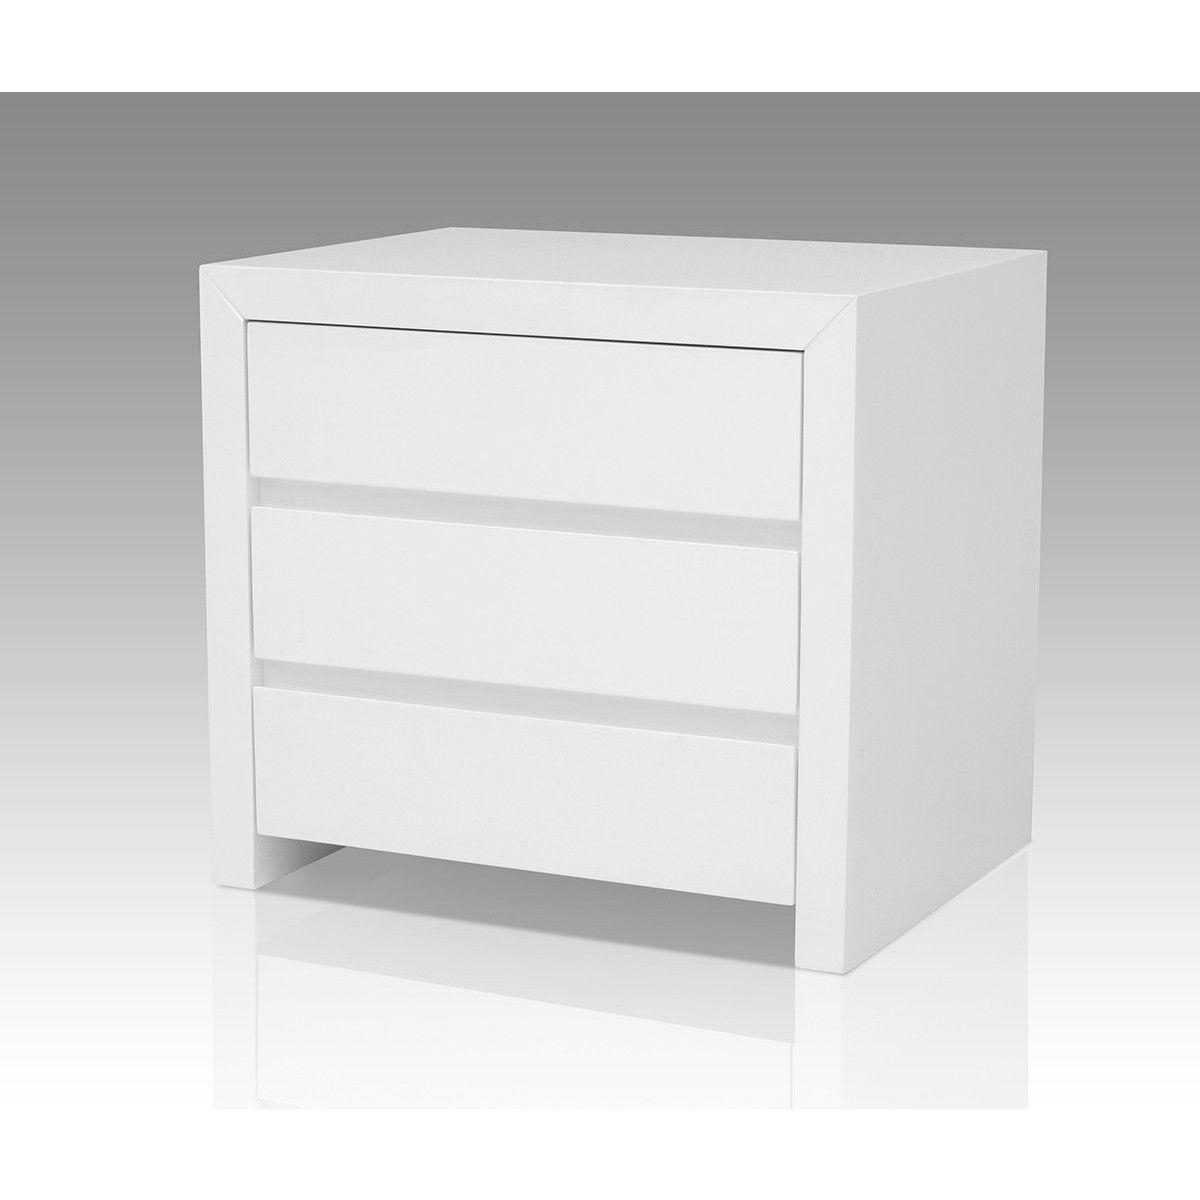 Modrest Bonita Modern White High Gloss 2 Drawer Nightstand Furniture Modern Nightstand White Bedroom Furniture